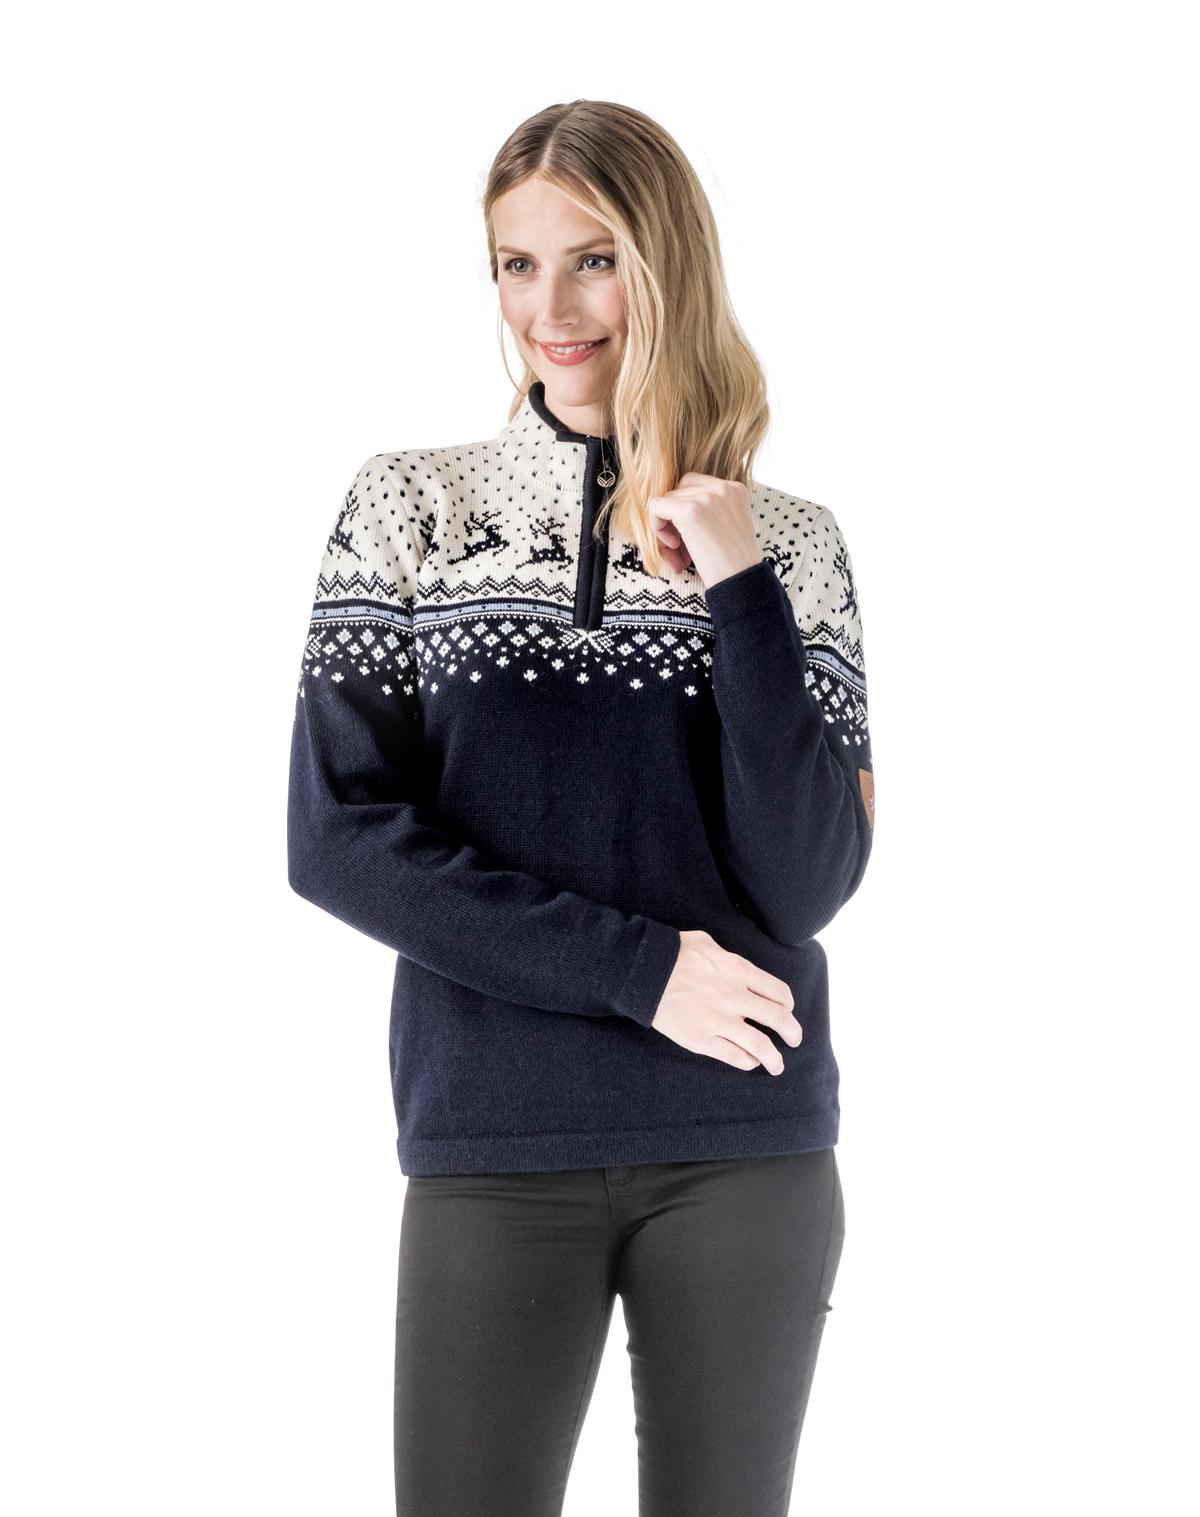 Tuva genser